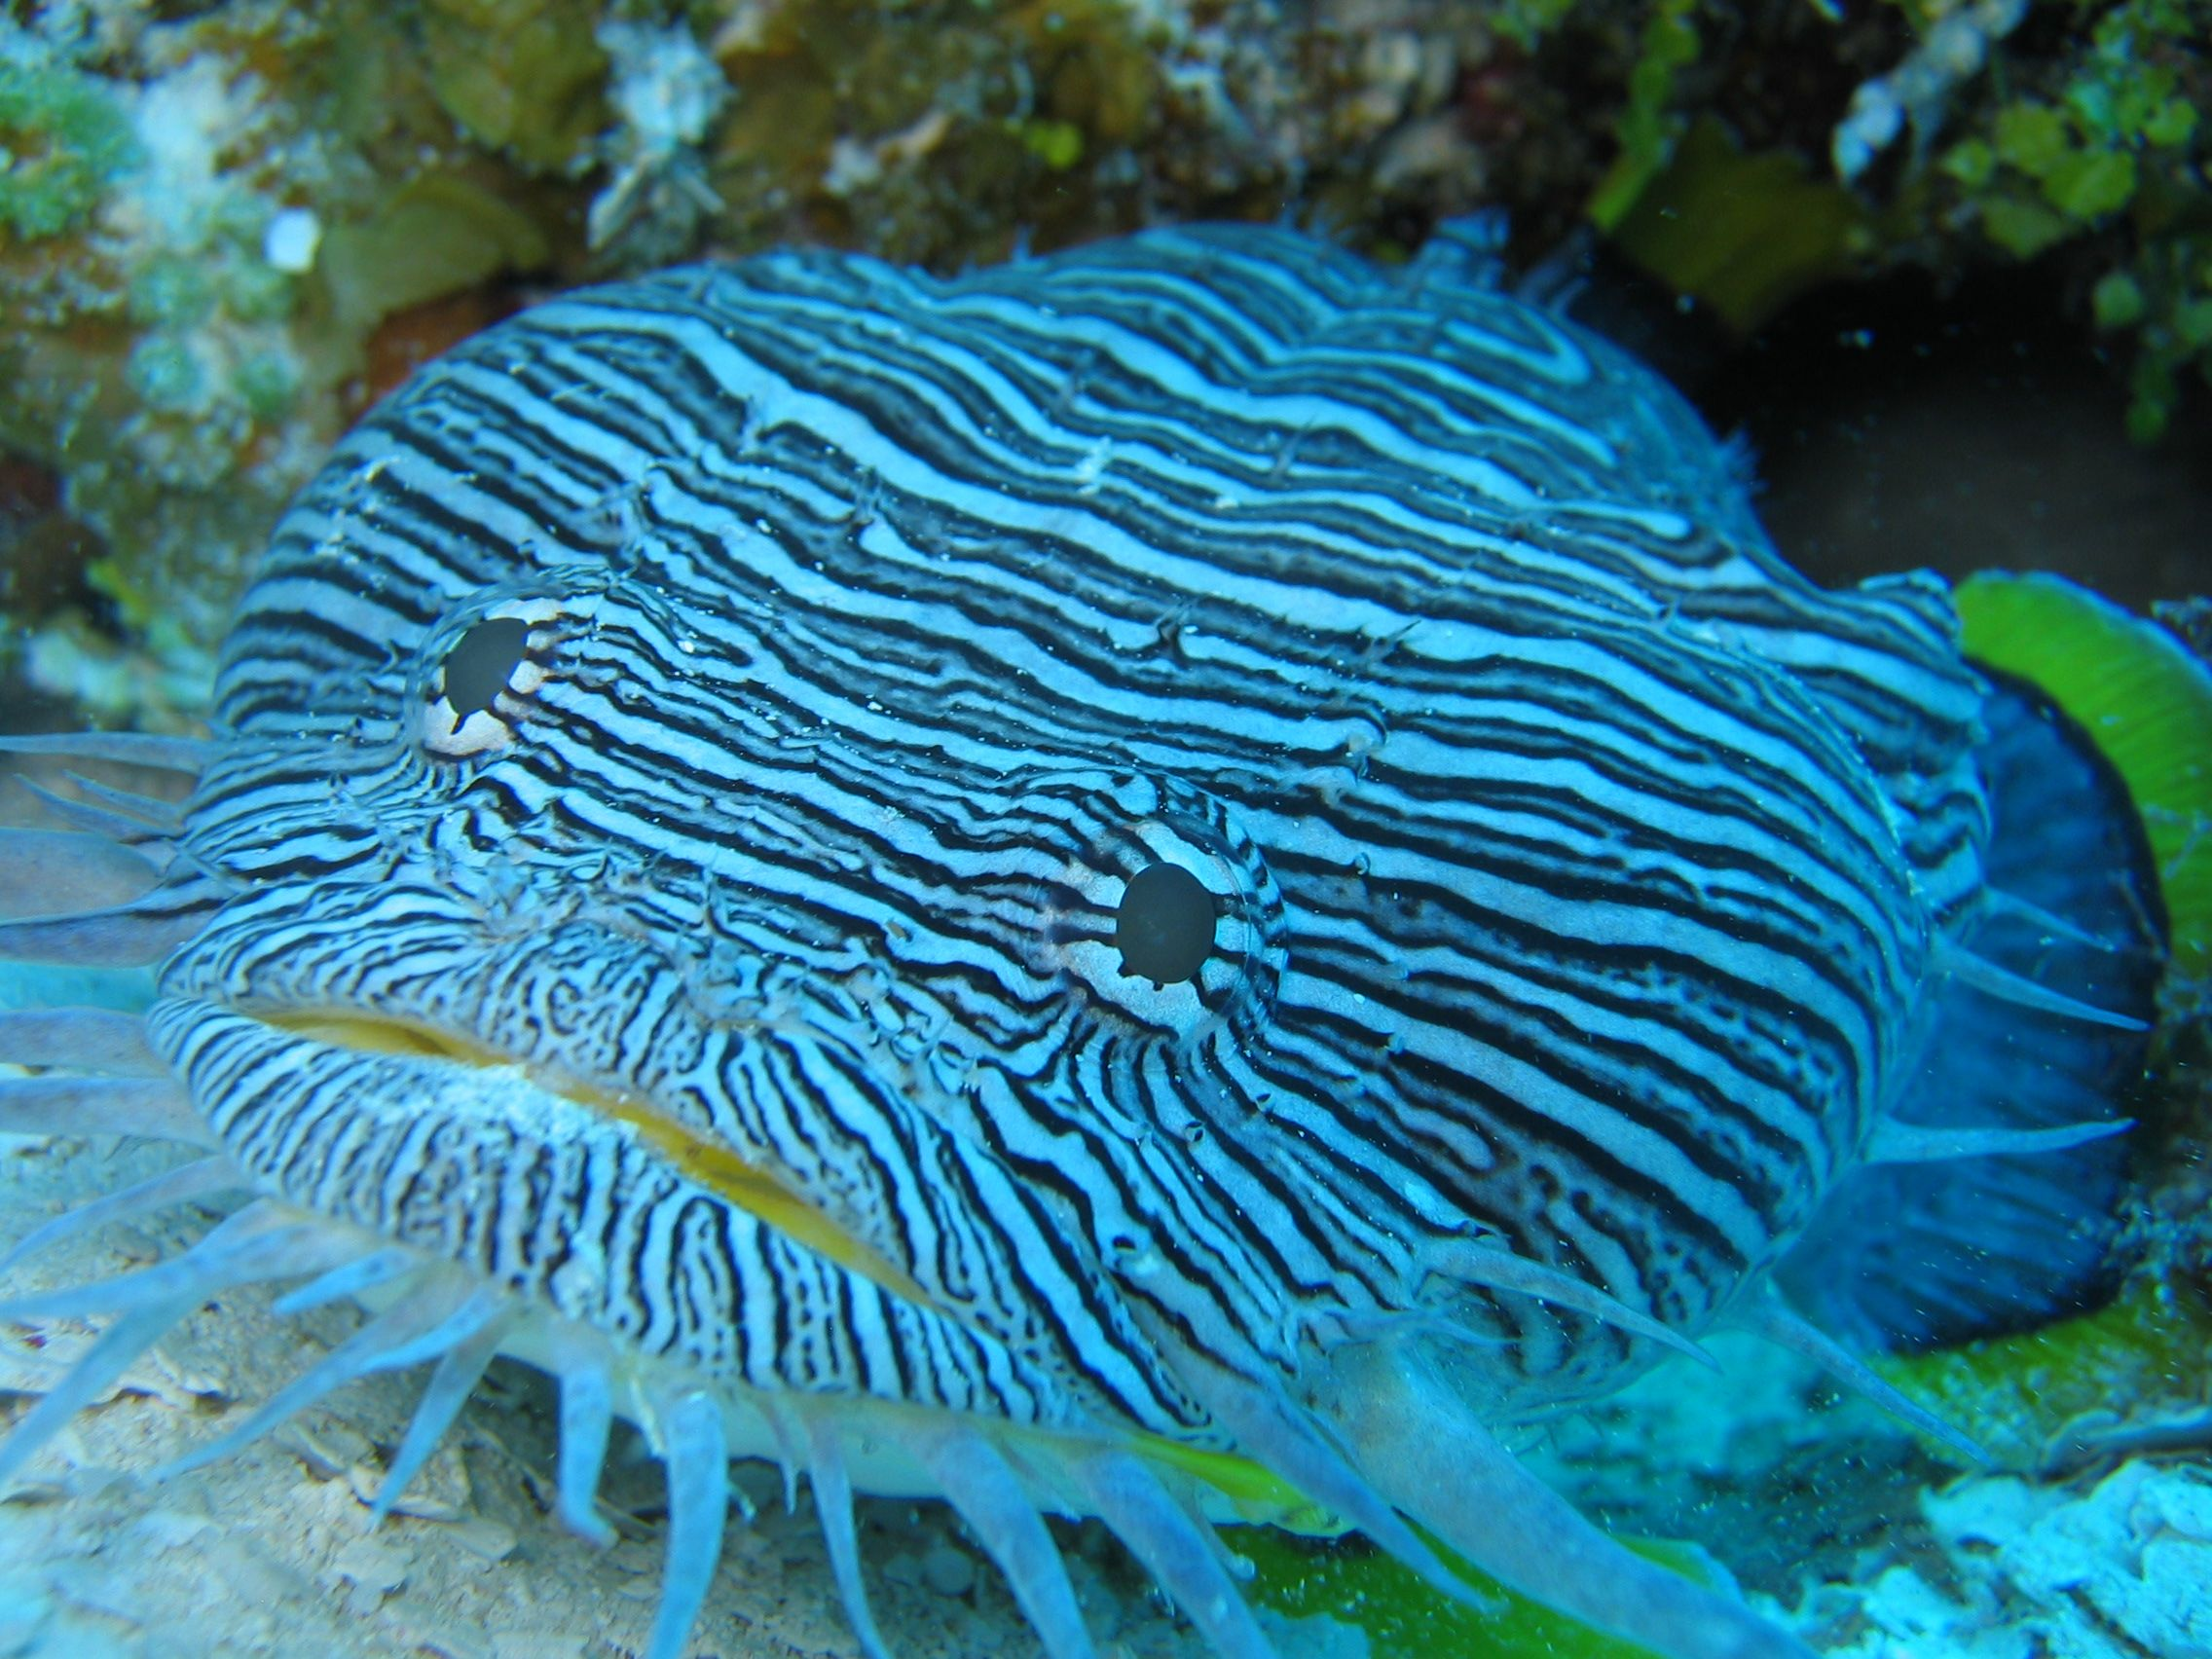 Cozumel Pro Dive Mexico Beautiful Sea Creatures Sea Fish Ocean Fishing